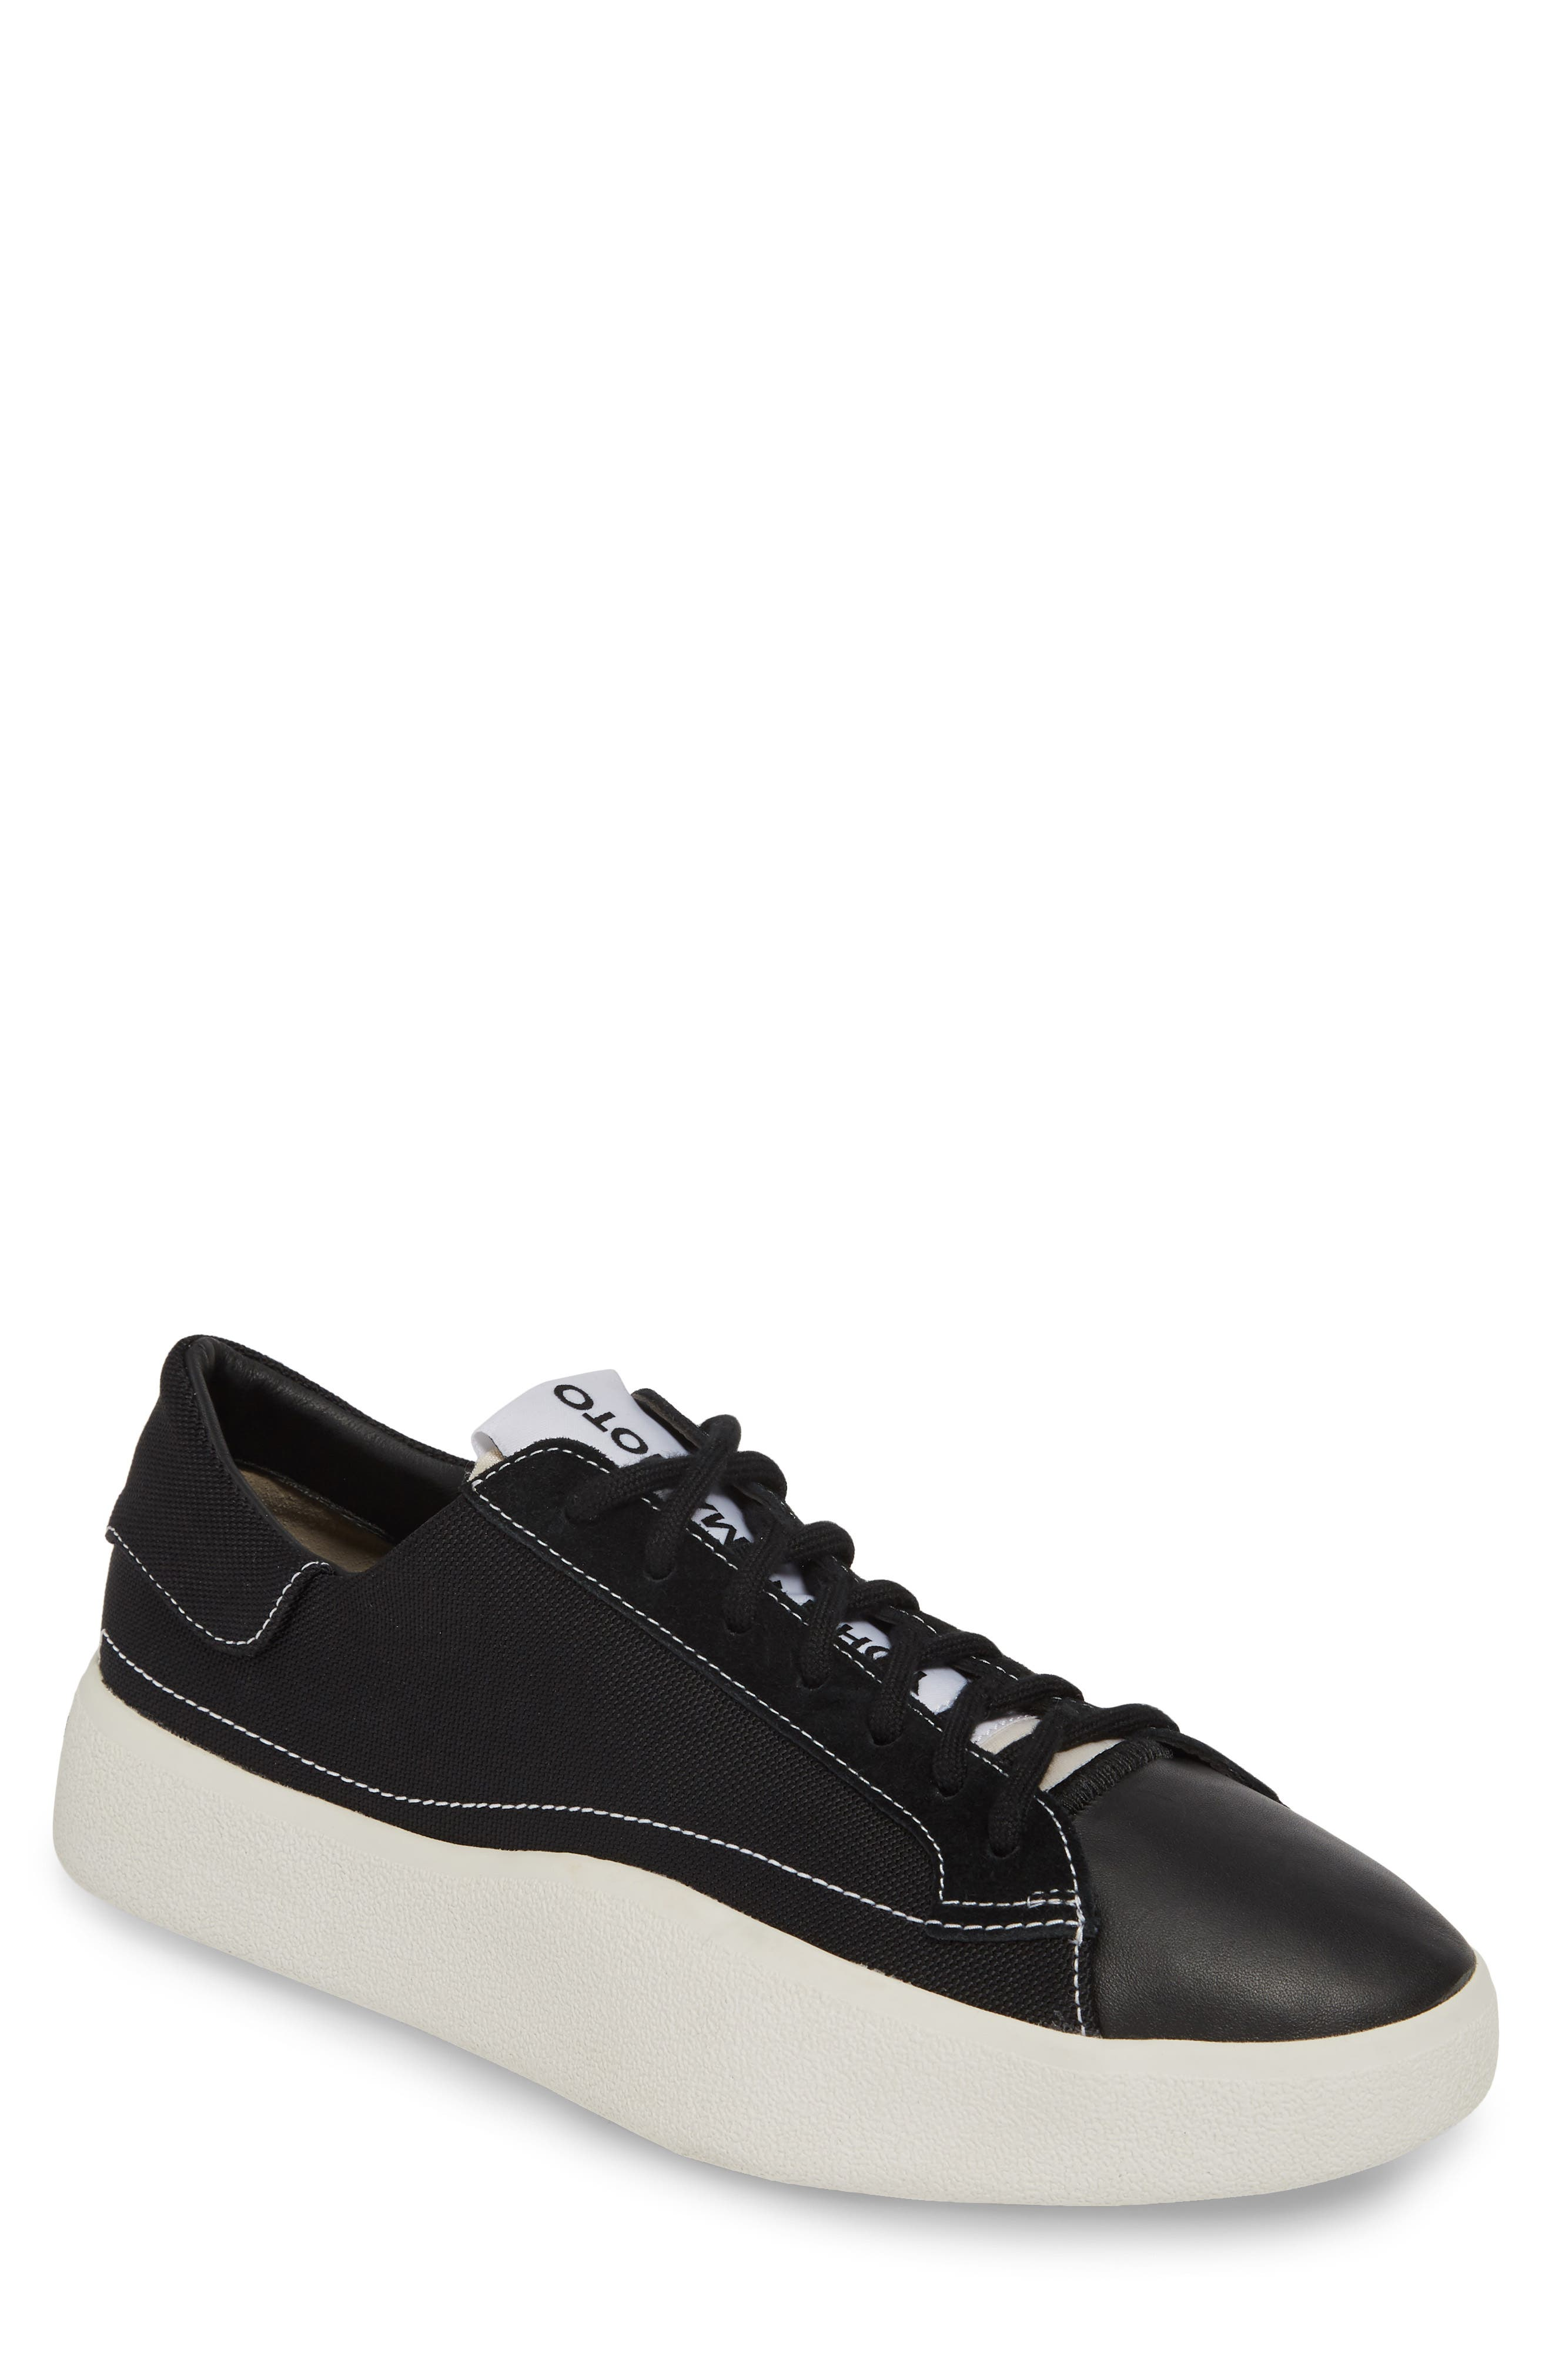 5754a06036f6 Women s Designer Sneakers